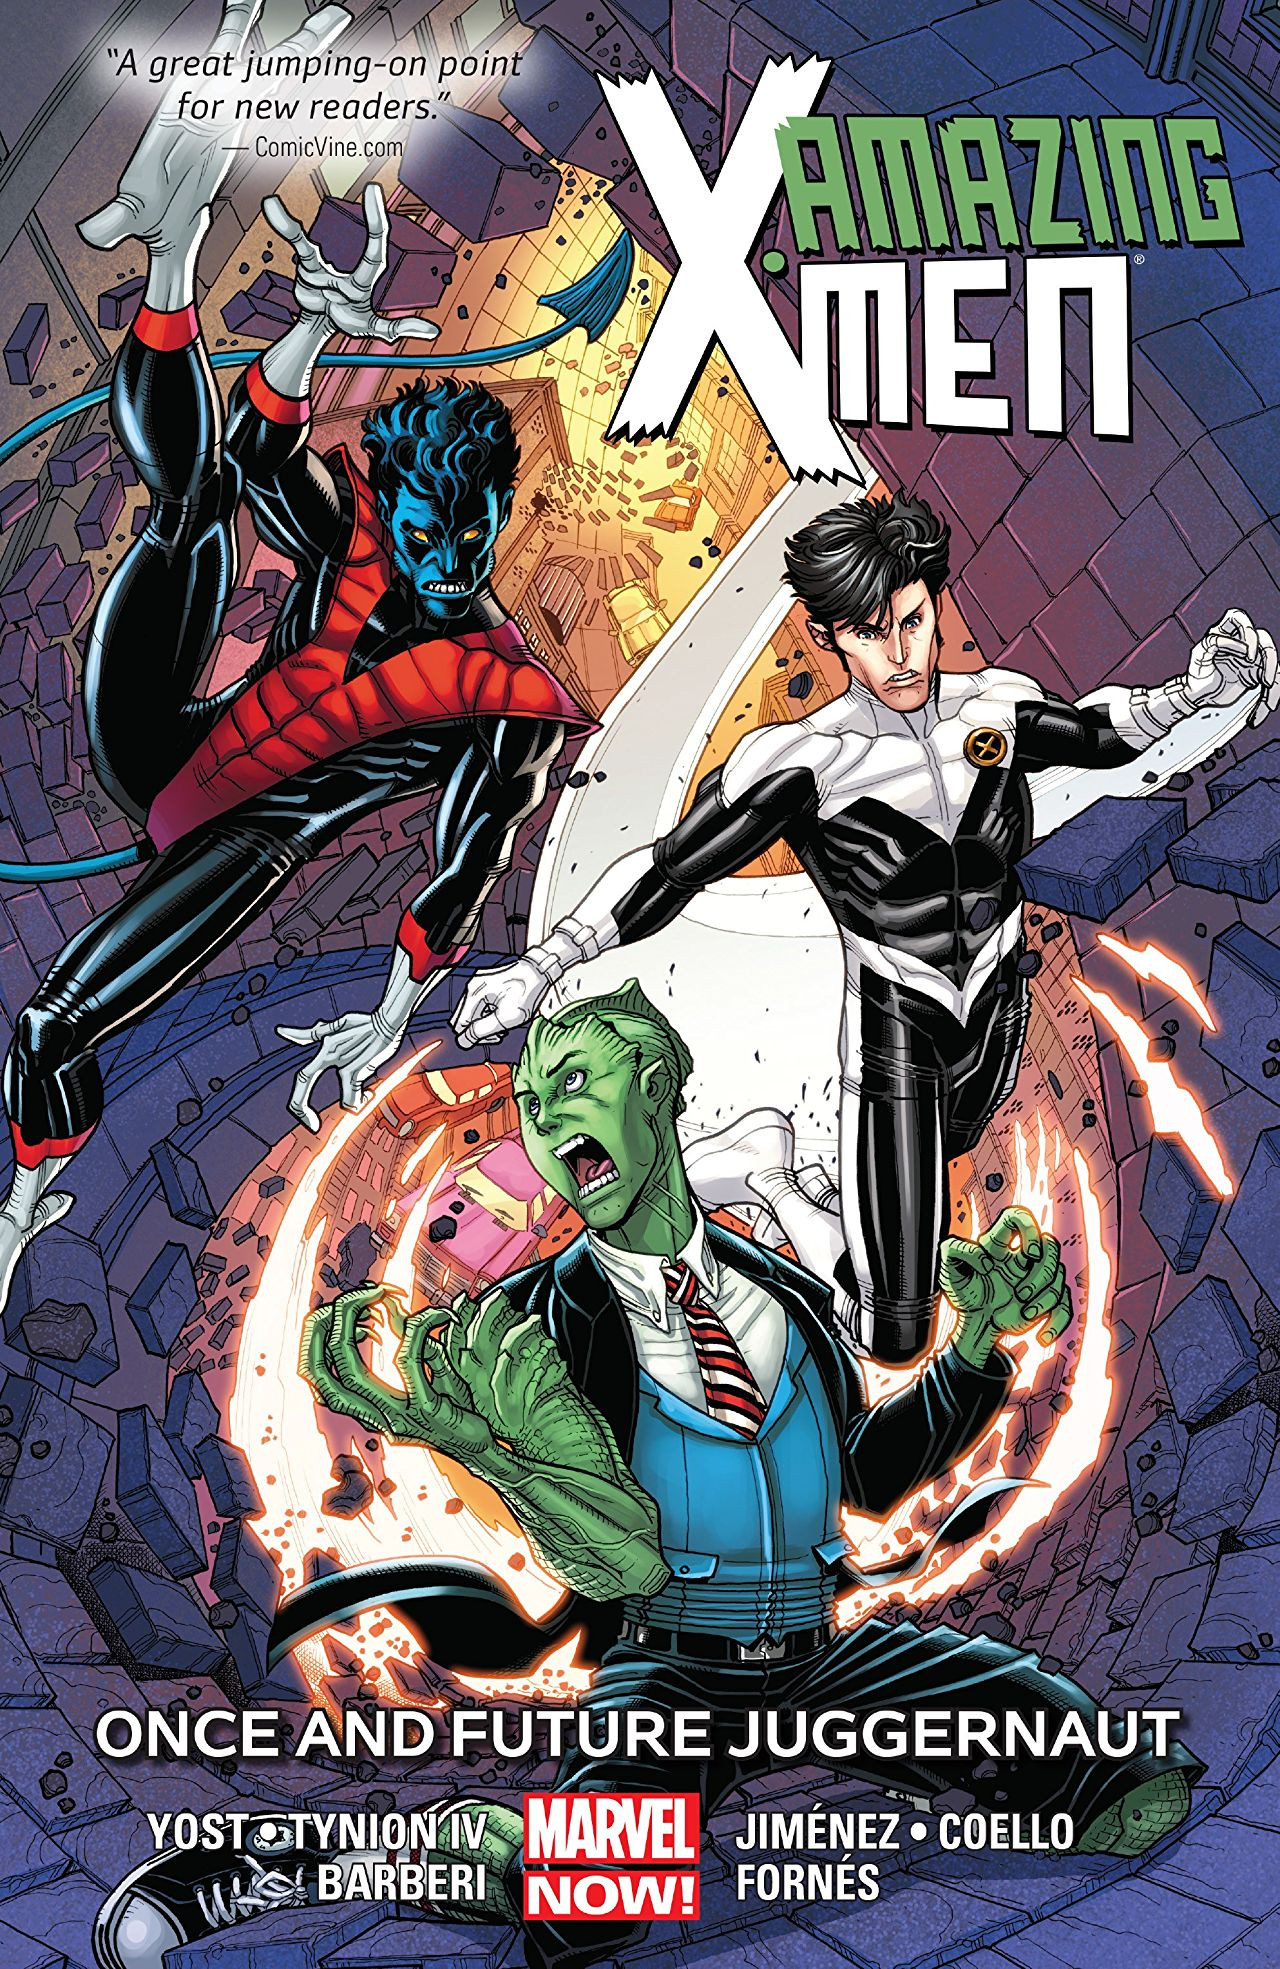 Amazing X-Men TPB Vol 1 3: Once and Future Juggernaut